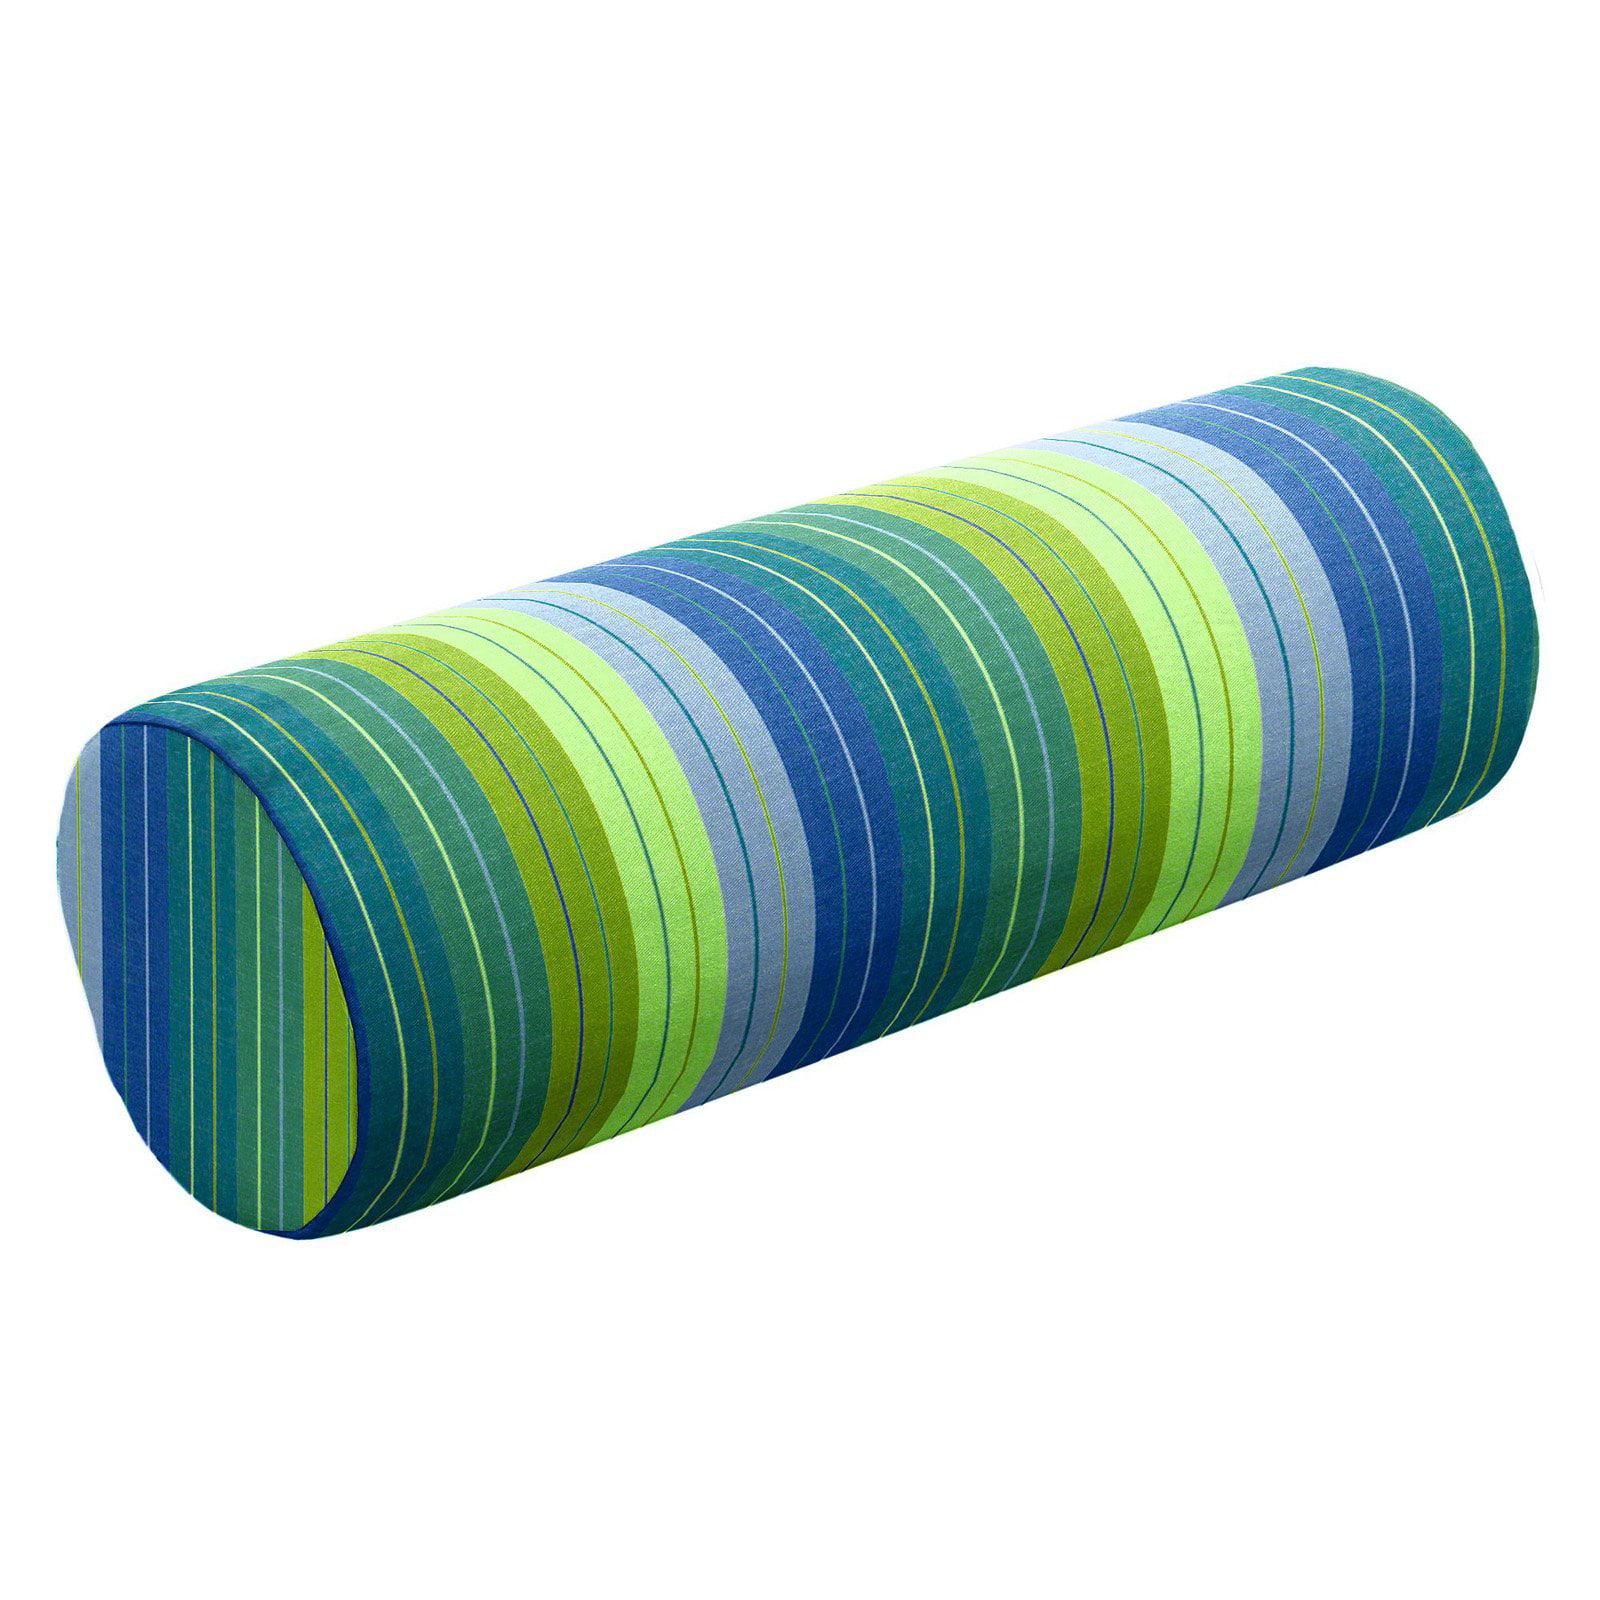 Cushion Source 20 X 6 In Striped Sunbrella Indoor Outdoor Bolster